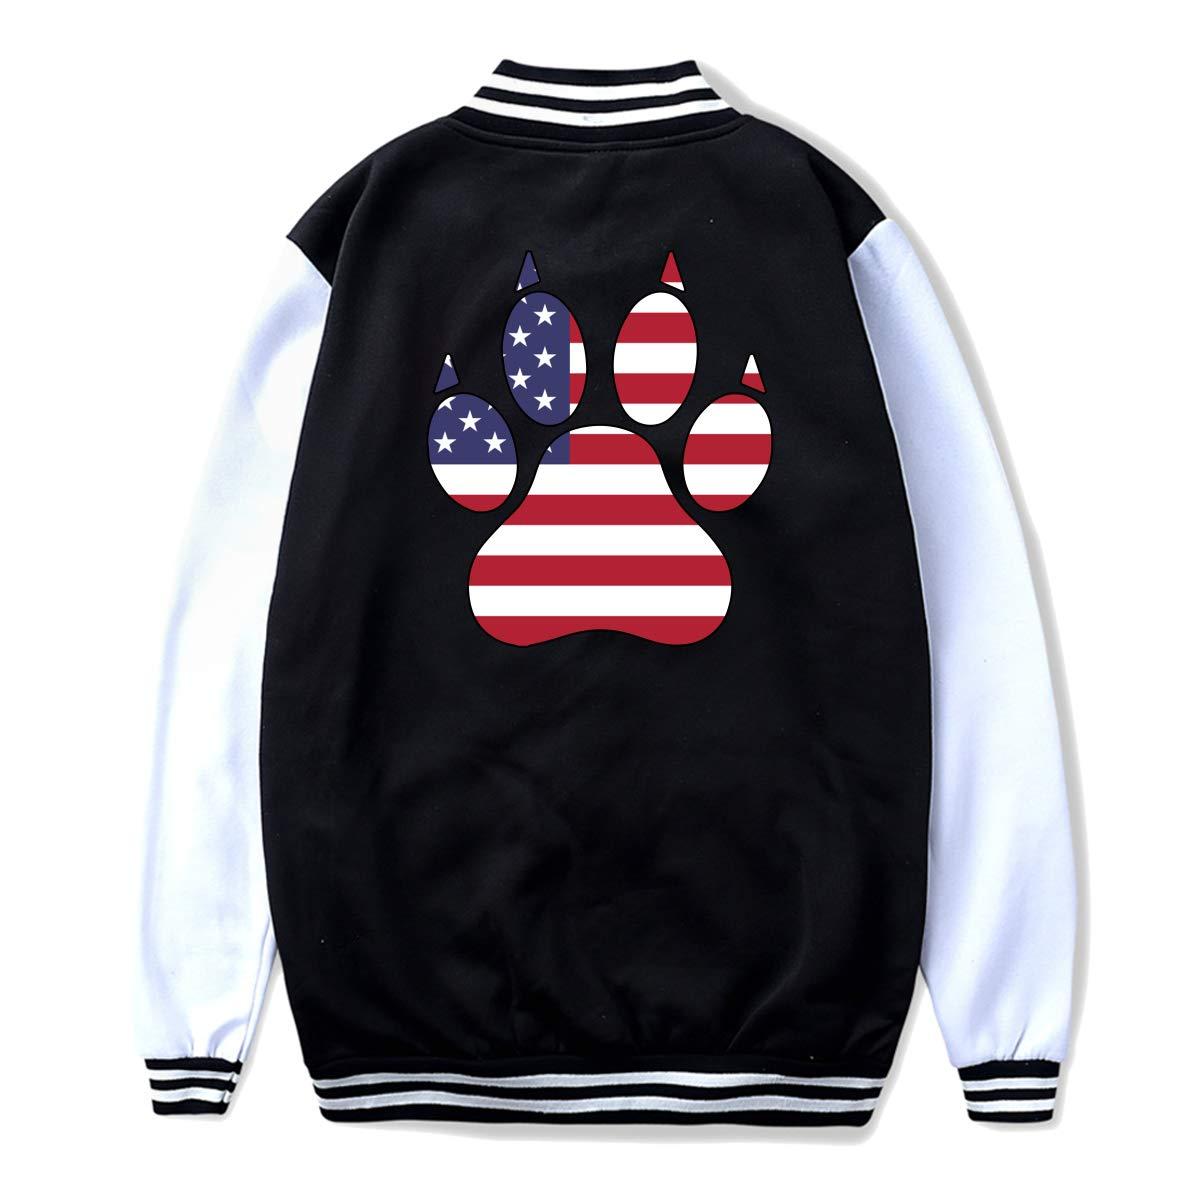 Unisex Youth Baseball Uniform Jacket American Flag Dog Paw Coat Sweatshirt Outwear Back Print